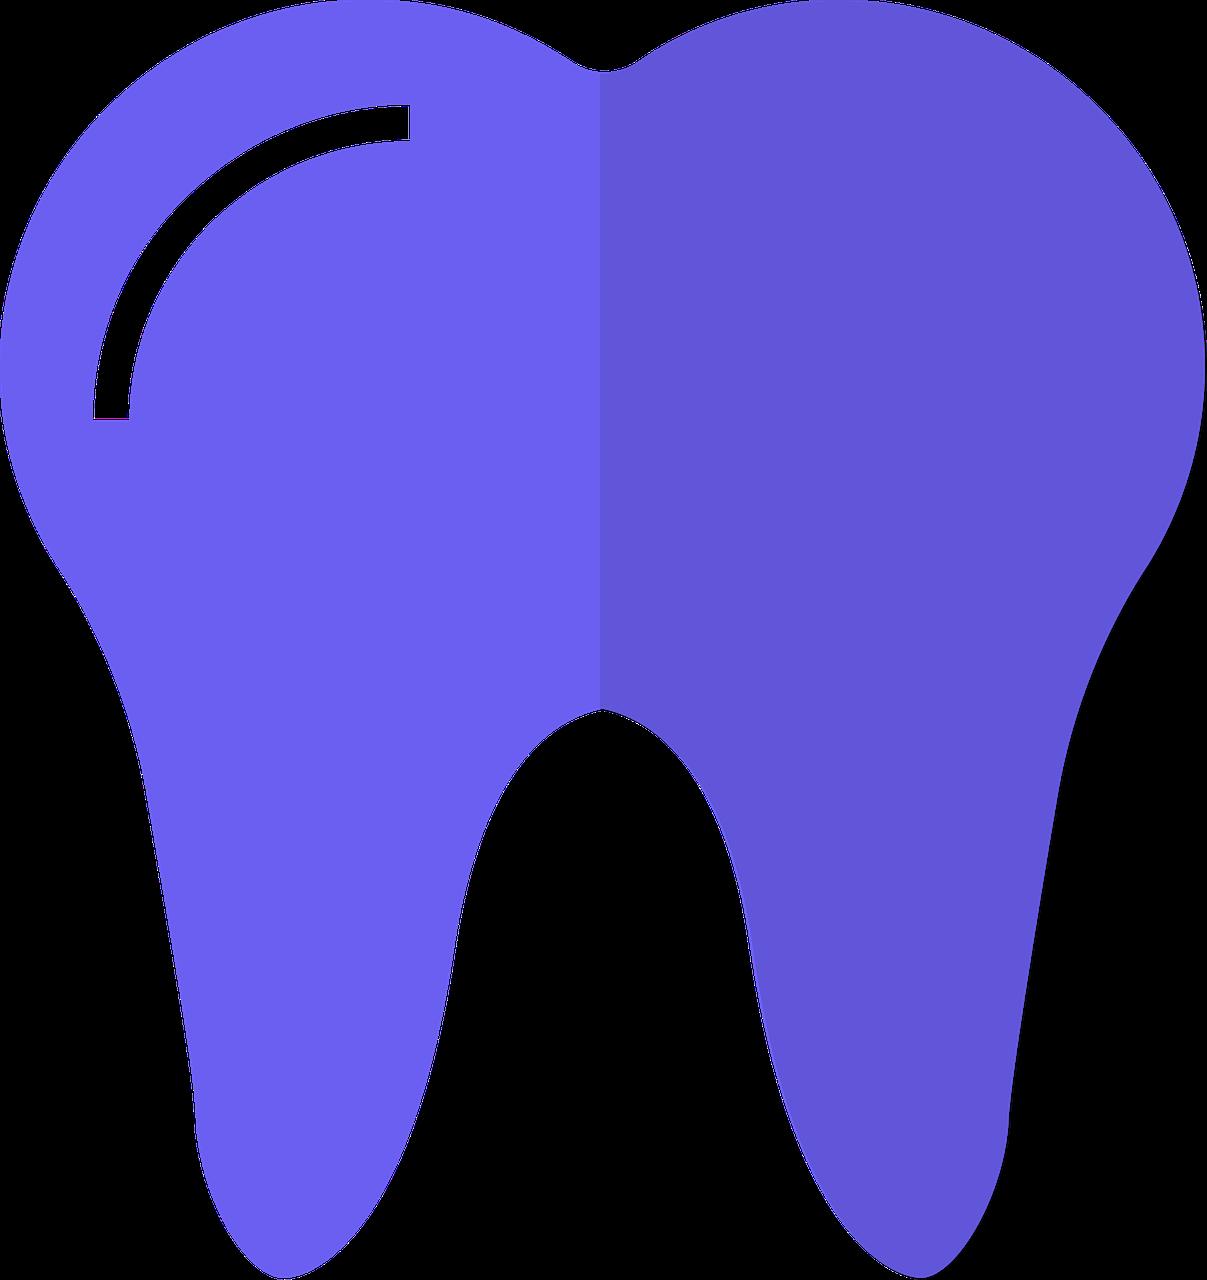 Tandarts Heide P vd tandarts spoed